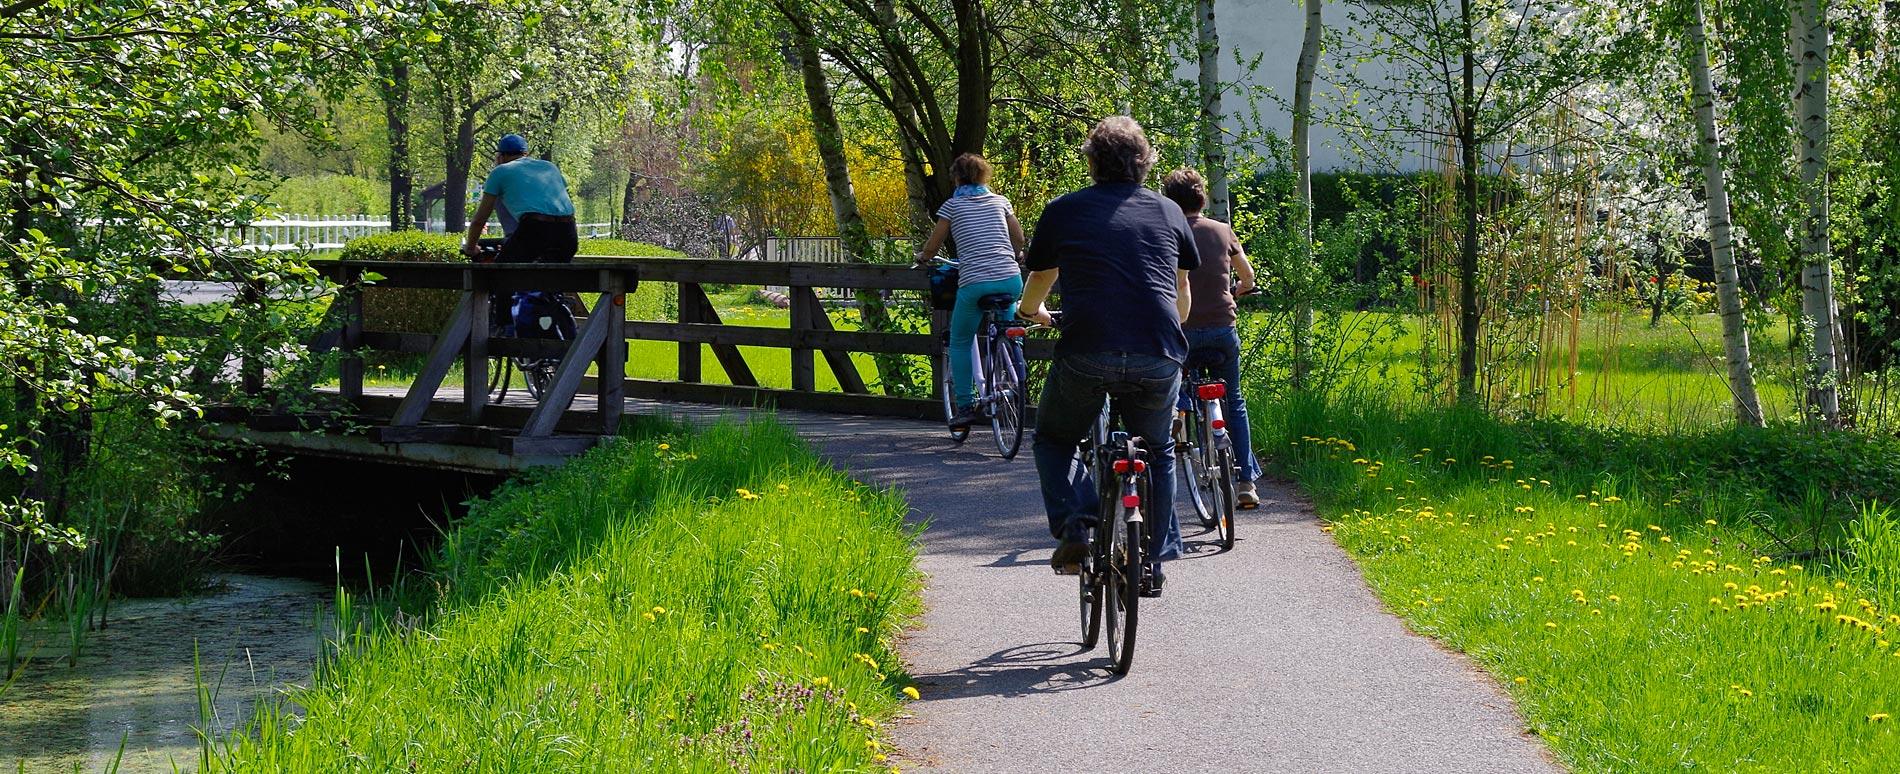 Bio-Höfe-Tour - buchbare Radtour im Spreewald, 175 km